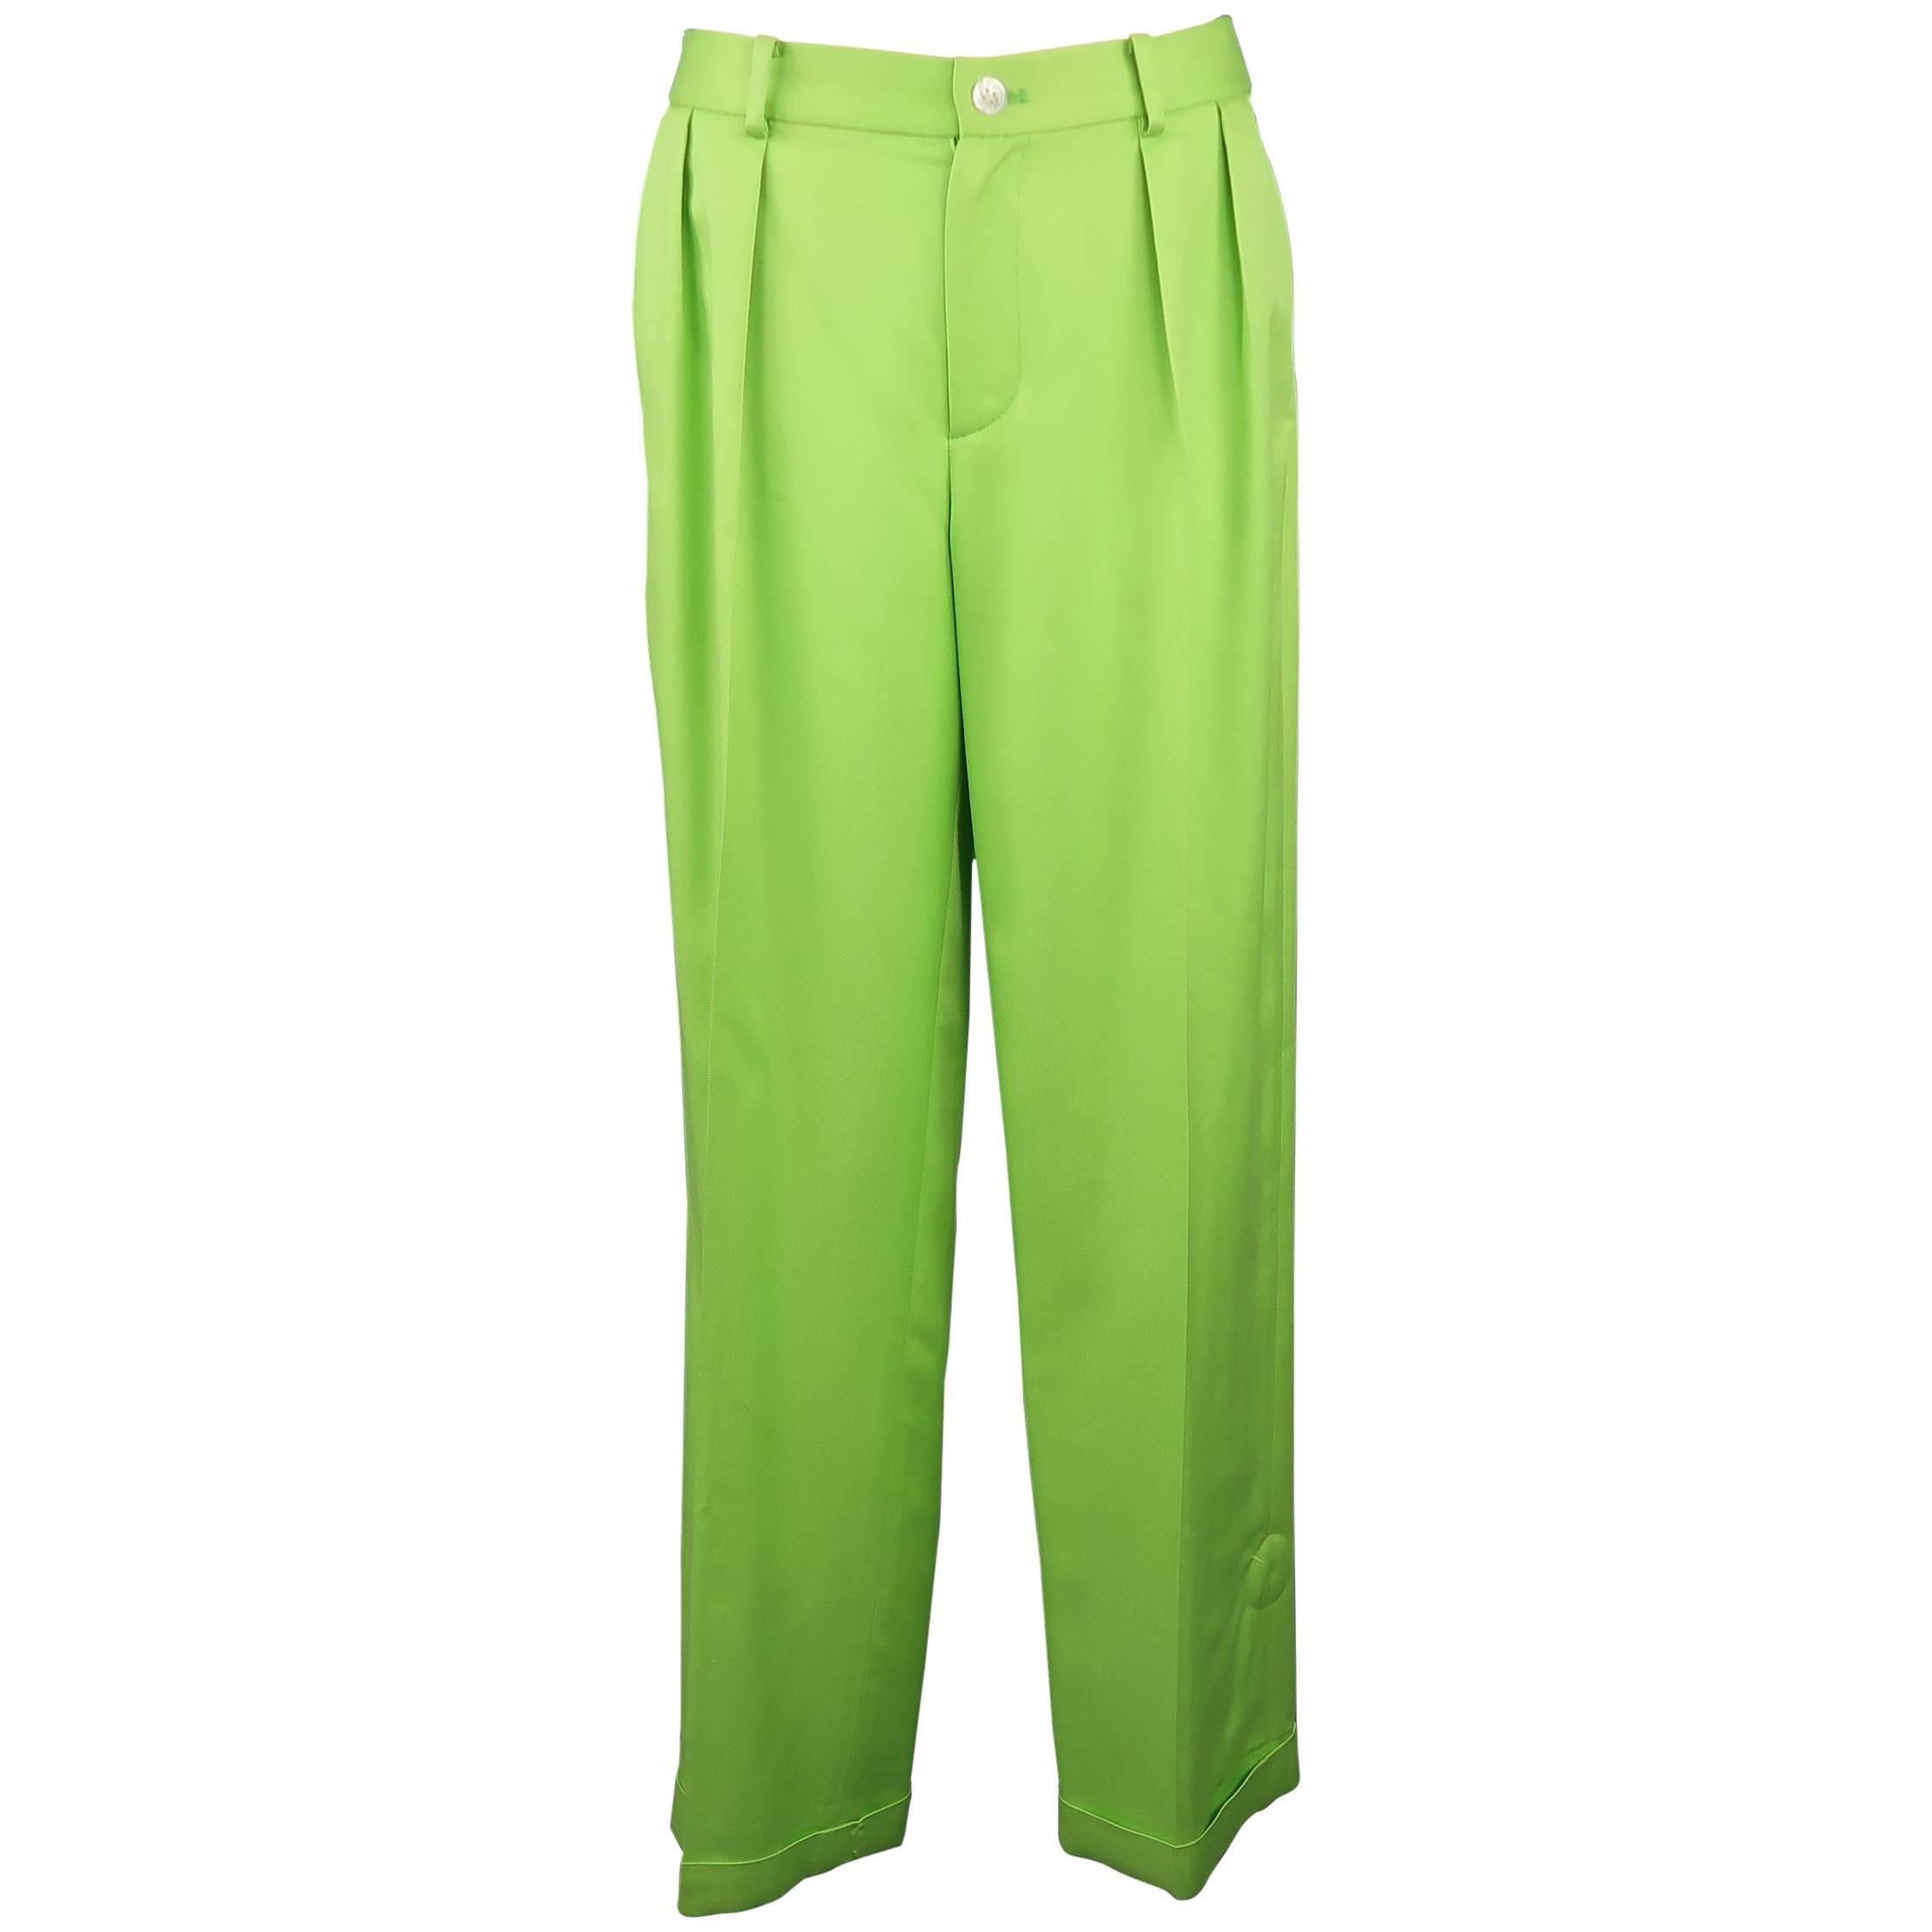 RALPH LAUREN Collection Size 6 Green Silk Twill Pleated Wide Leg Dress Pants